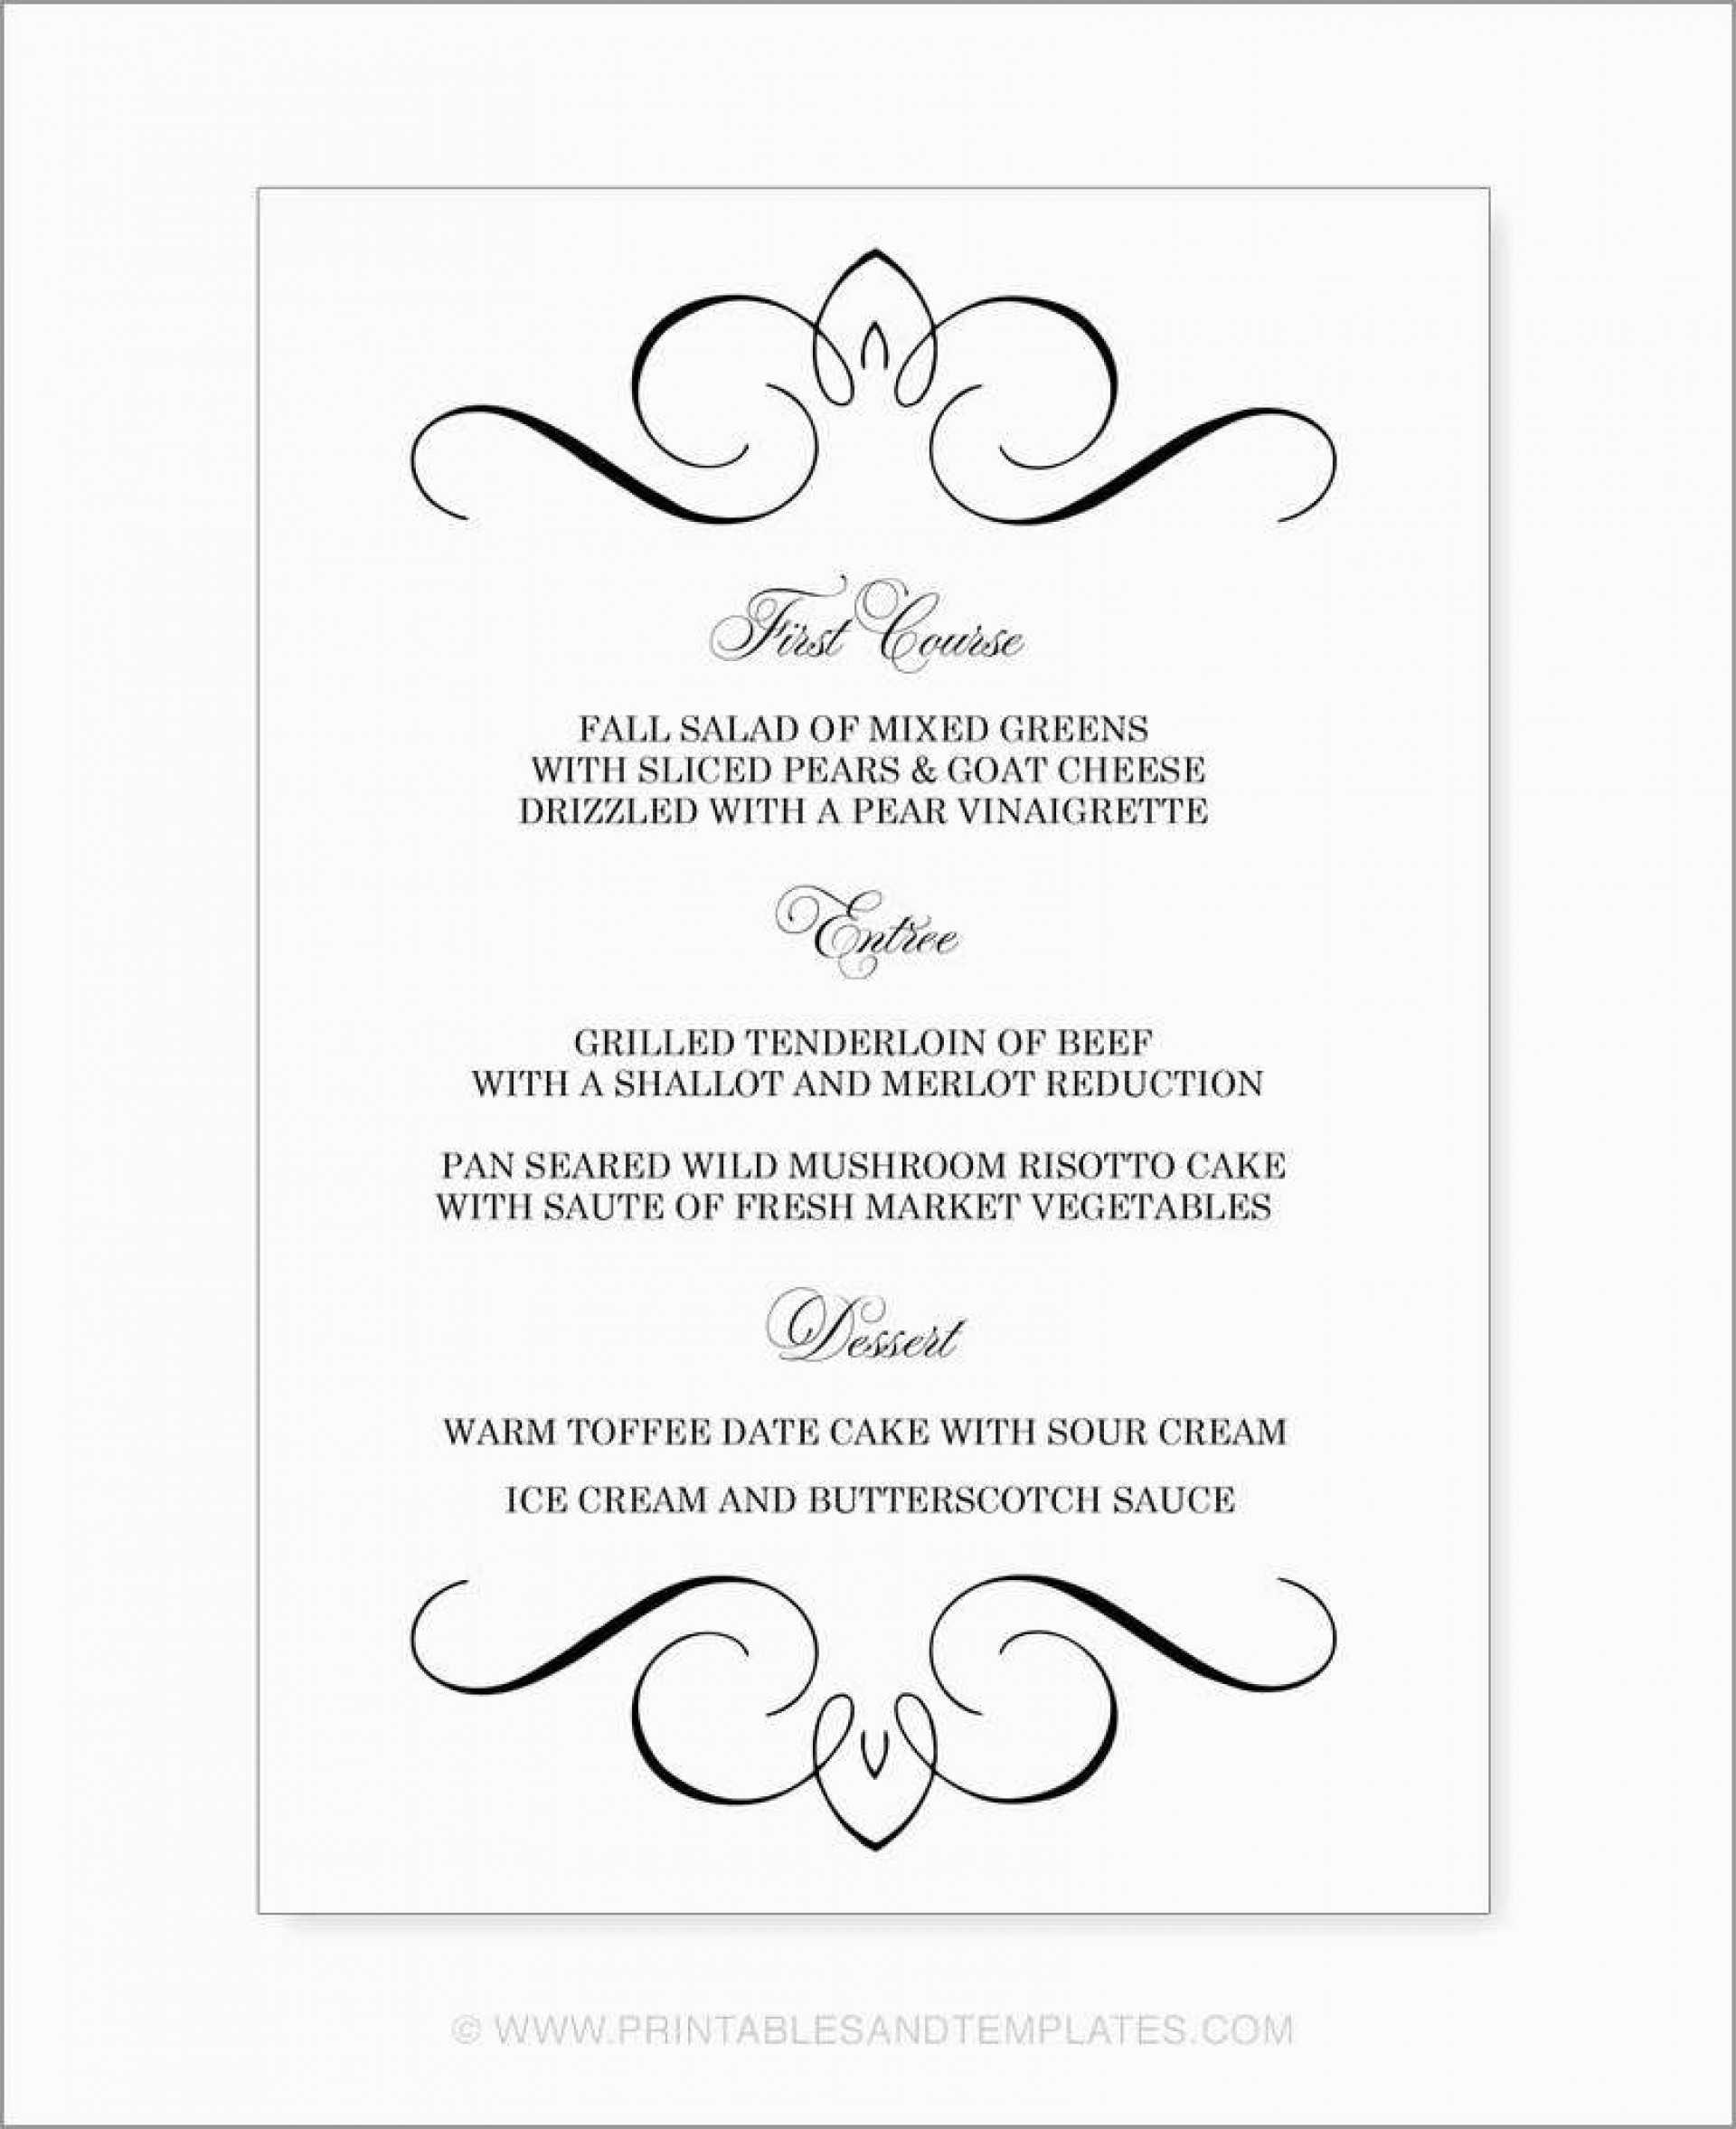 011 Template Ideas Microsoft Word Wedding Menu Free With Regard To Free Wedding Menu Template For Word